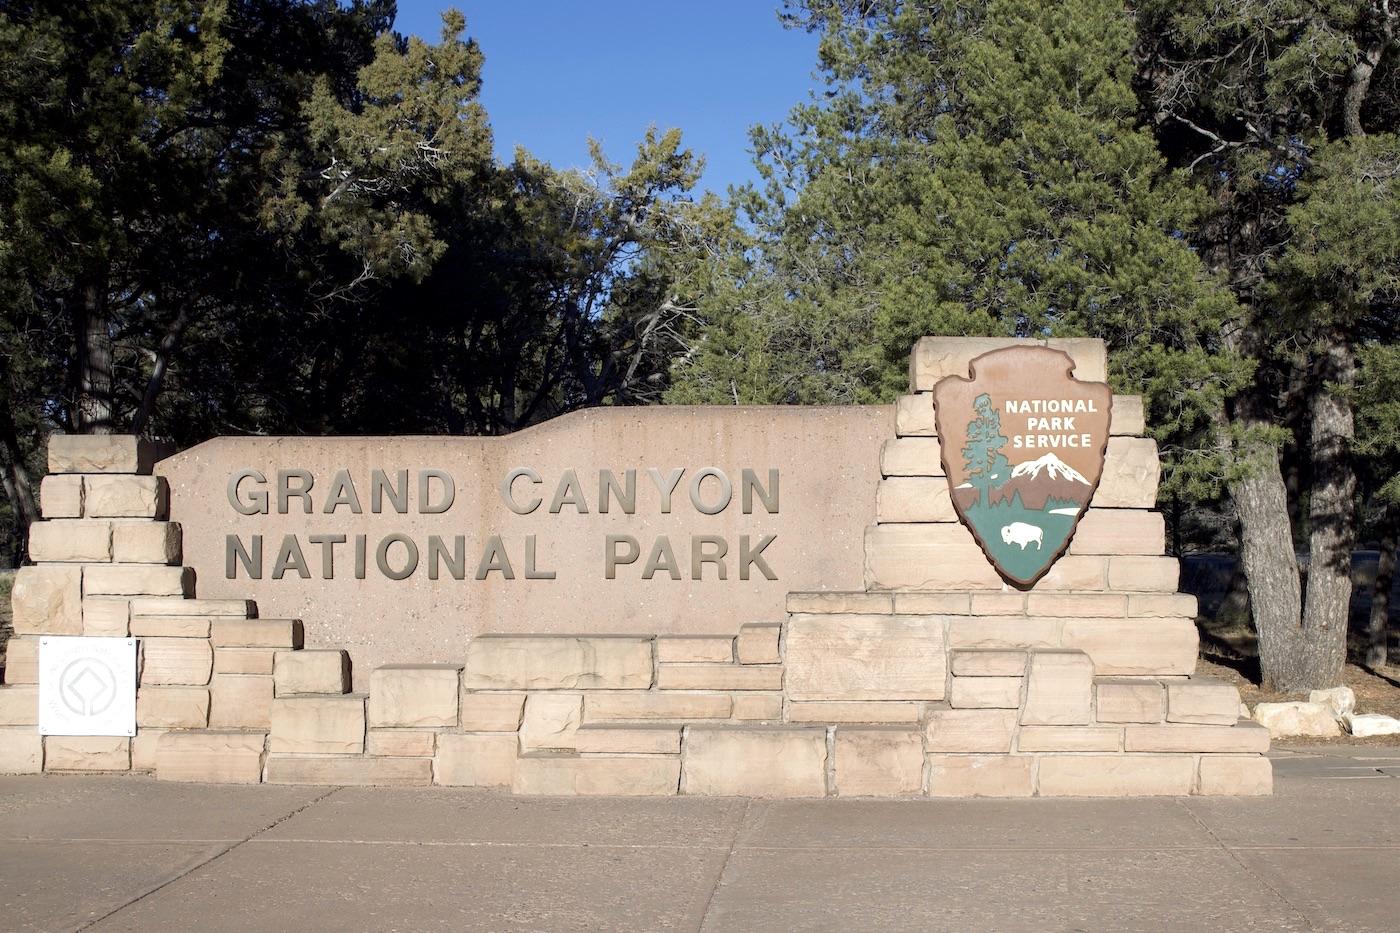 A Cheap Hotel Near Grand Canyon National Park South Rim Grand Canyon Inn Travelwriter Nl